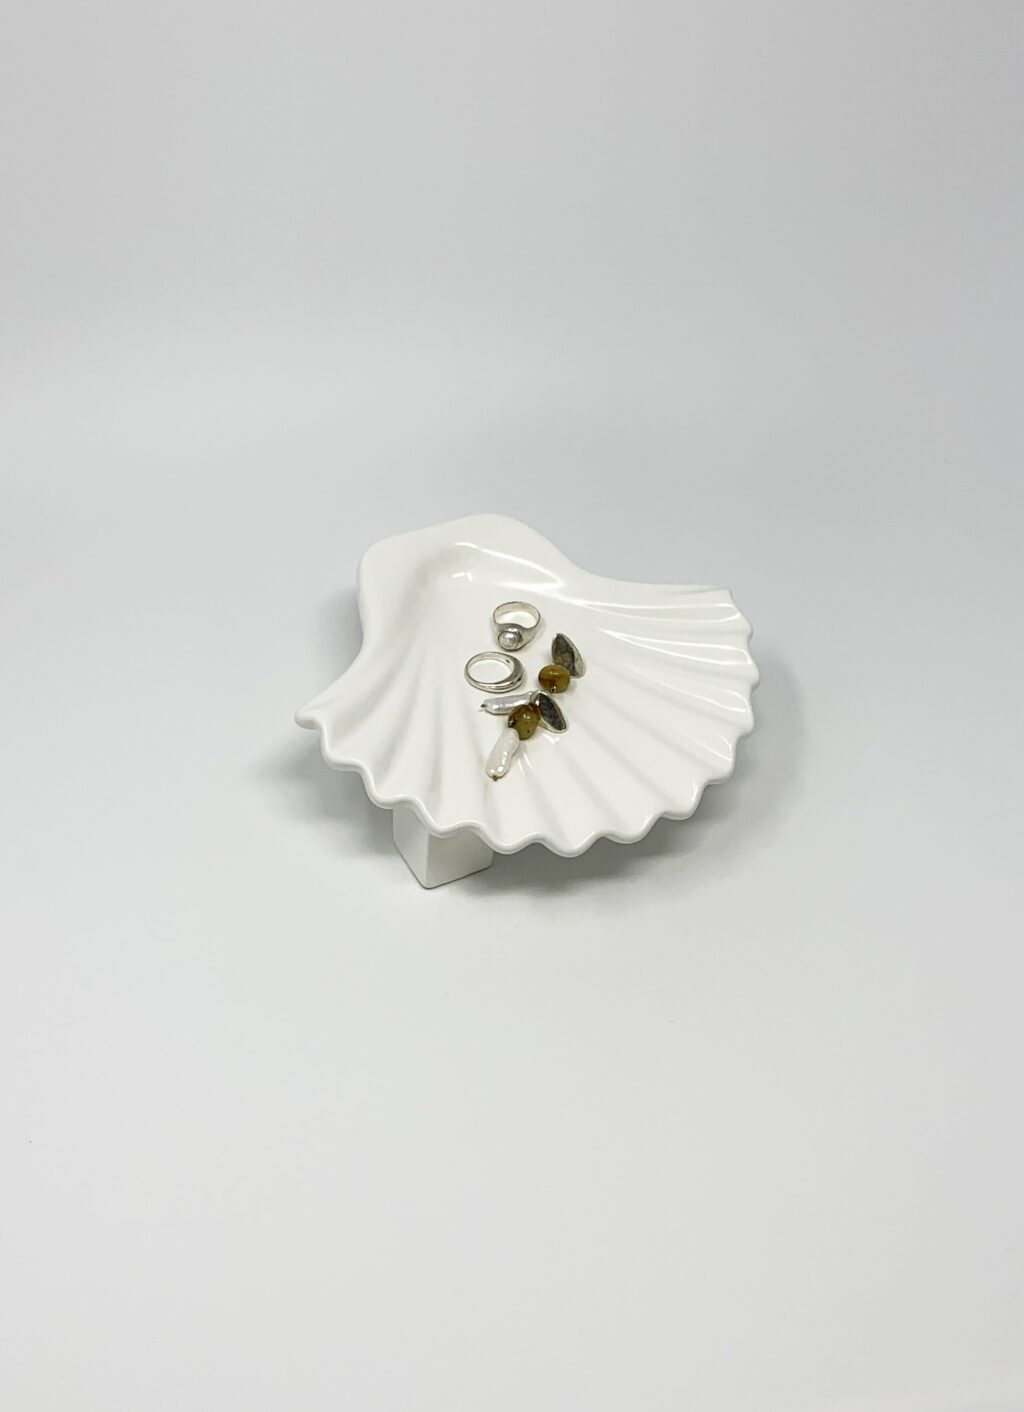 Los Objetos Decorativos - Seashell Plate - White